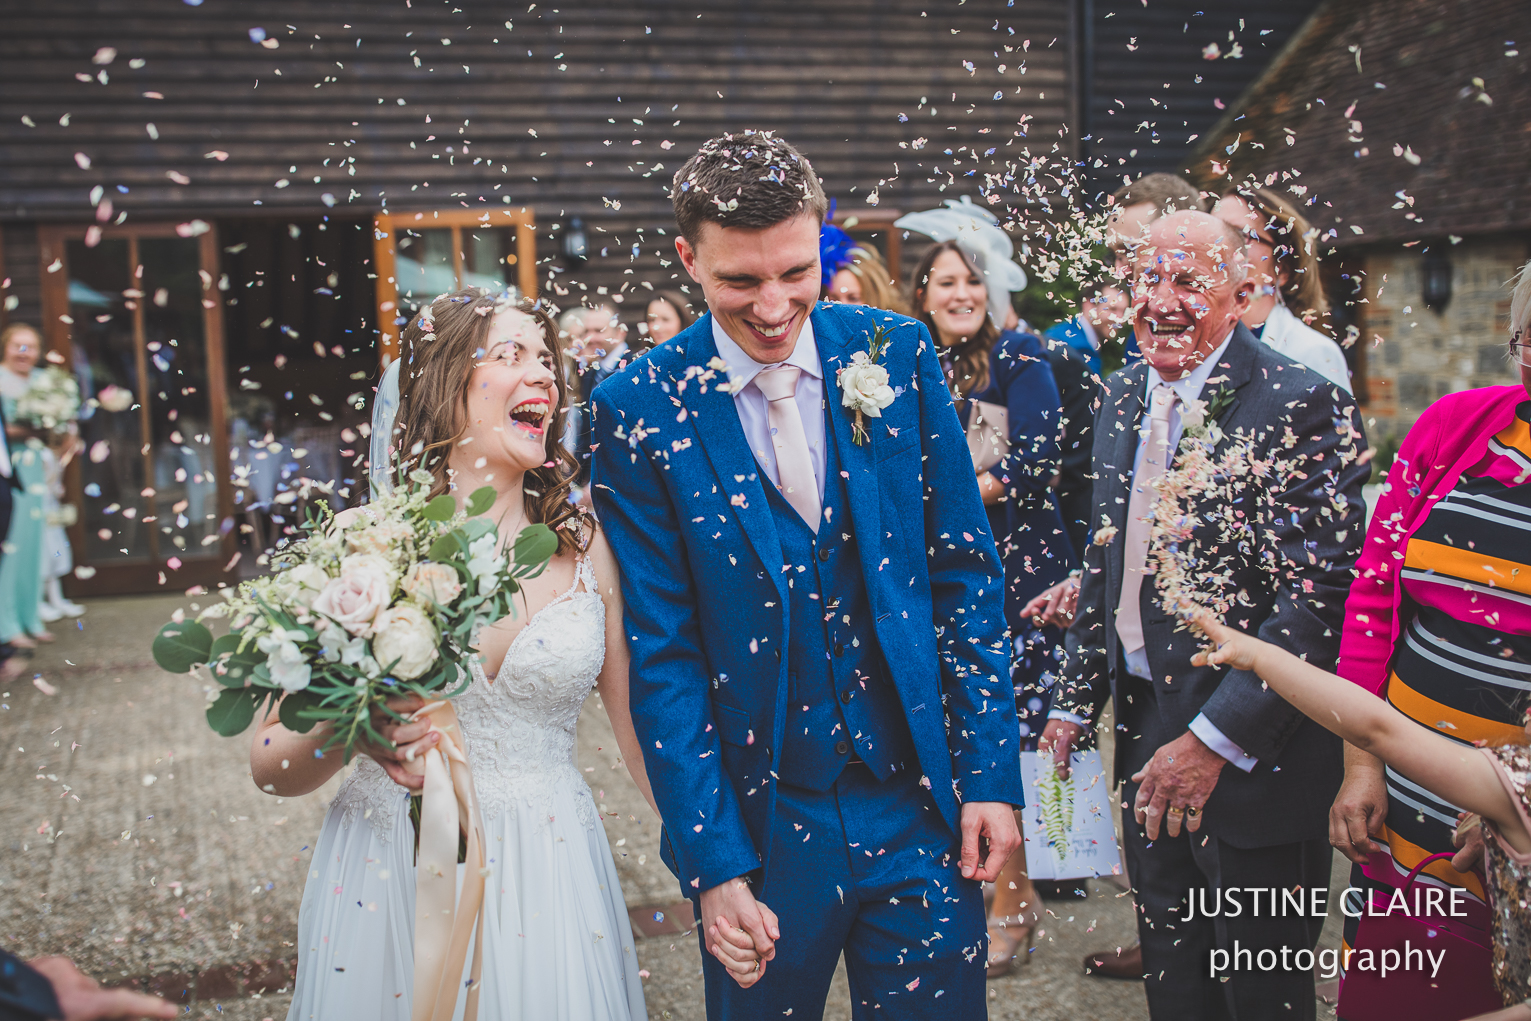 Fitzleroi Fittleworth petworth Billingshurst farm Wedding Photography by Justine Claire photographer Arundel Worthing Brighton-23.jpg